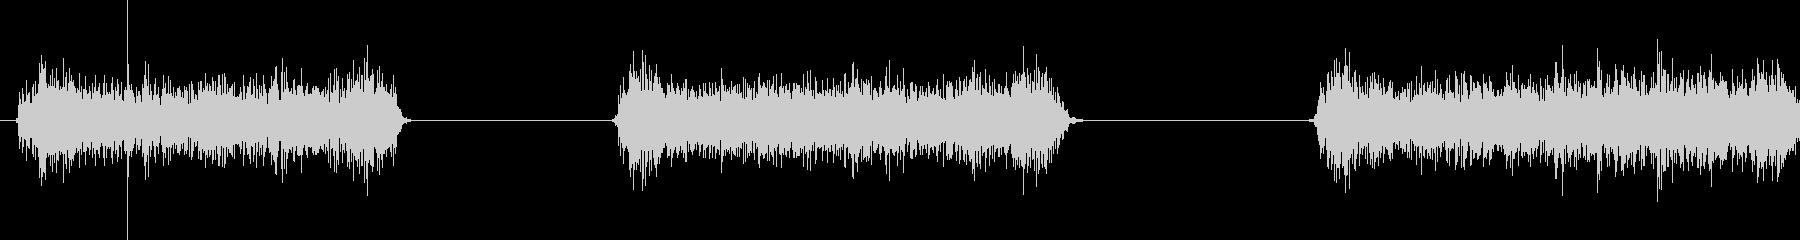 AEROSOL CAN 1:3回の...の未再生の波形